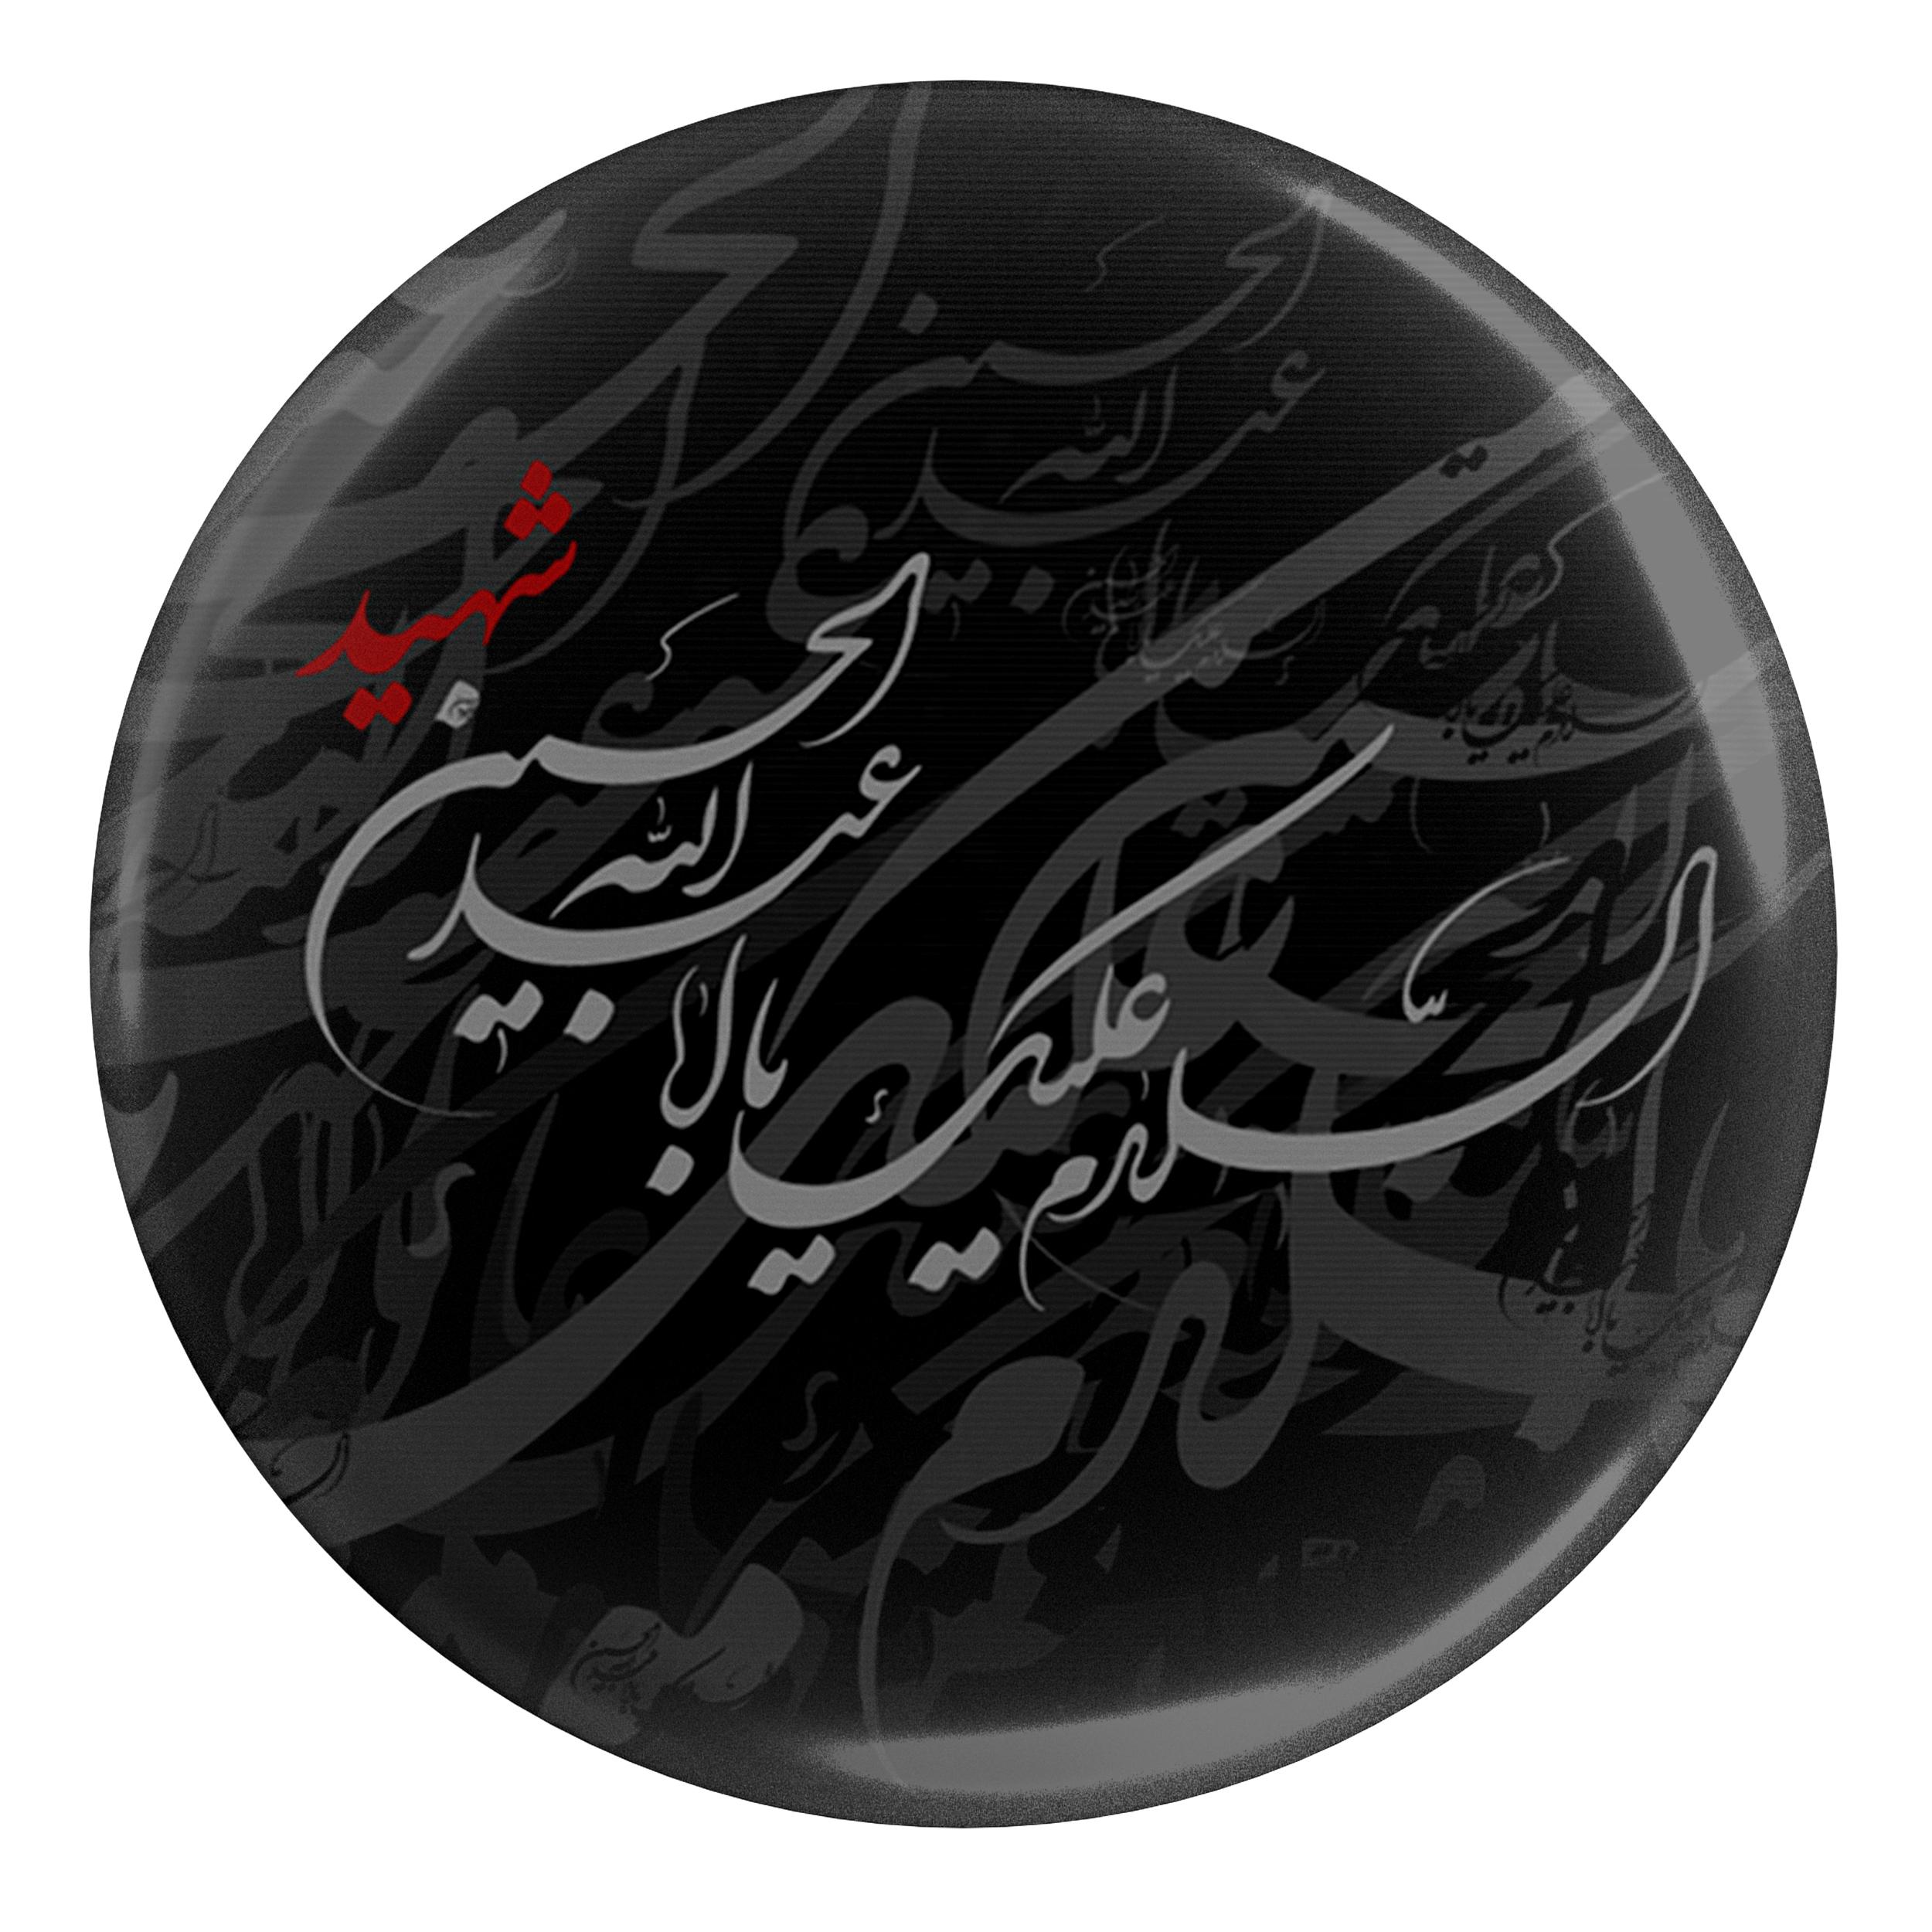 پیکسل طرح السلام علیک یا اباعبدالله حسین شهید مدل S2353